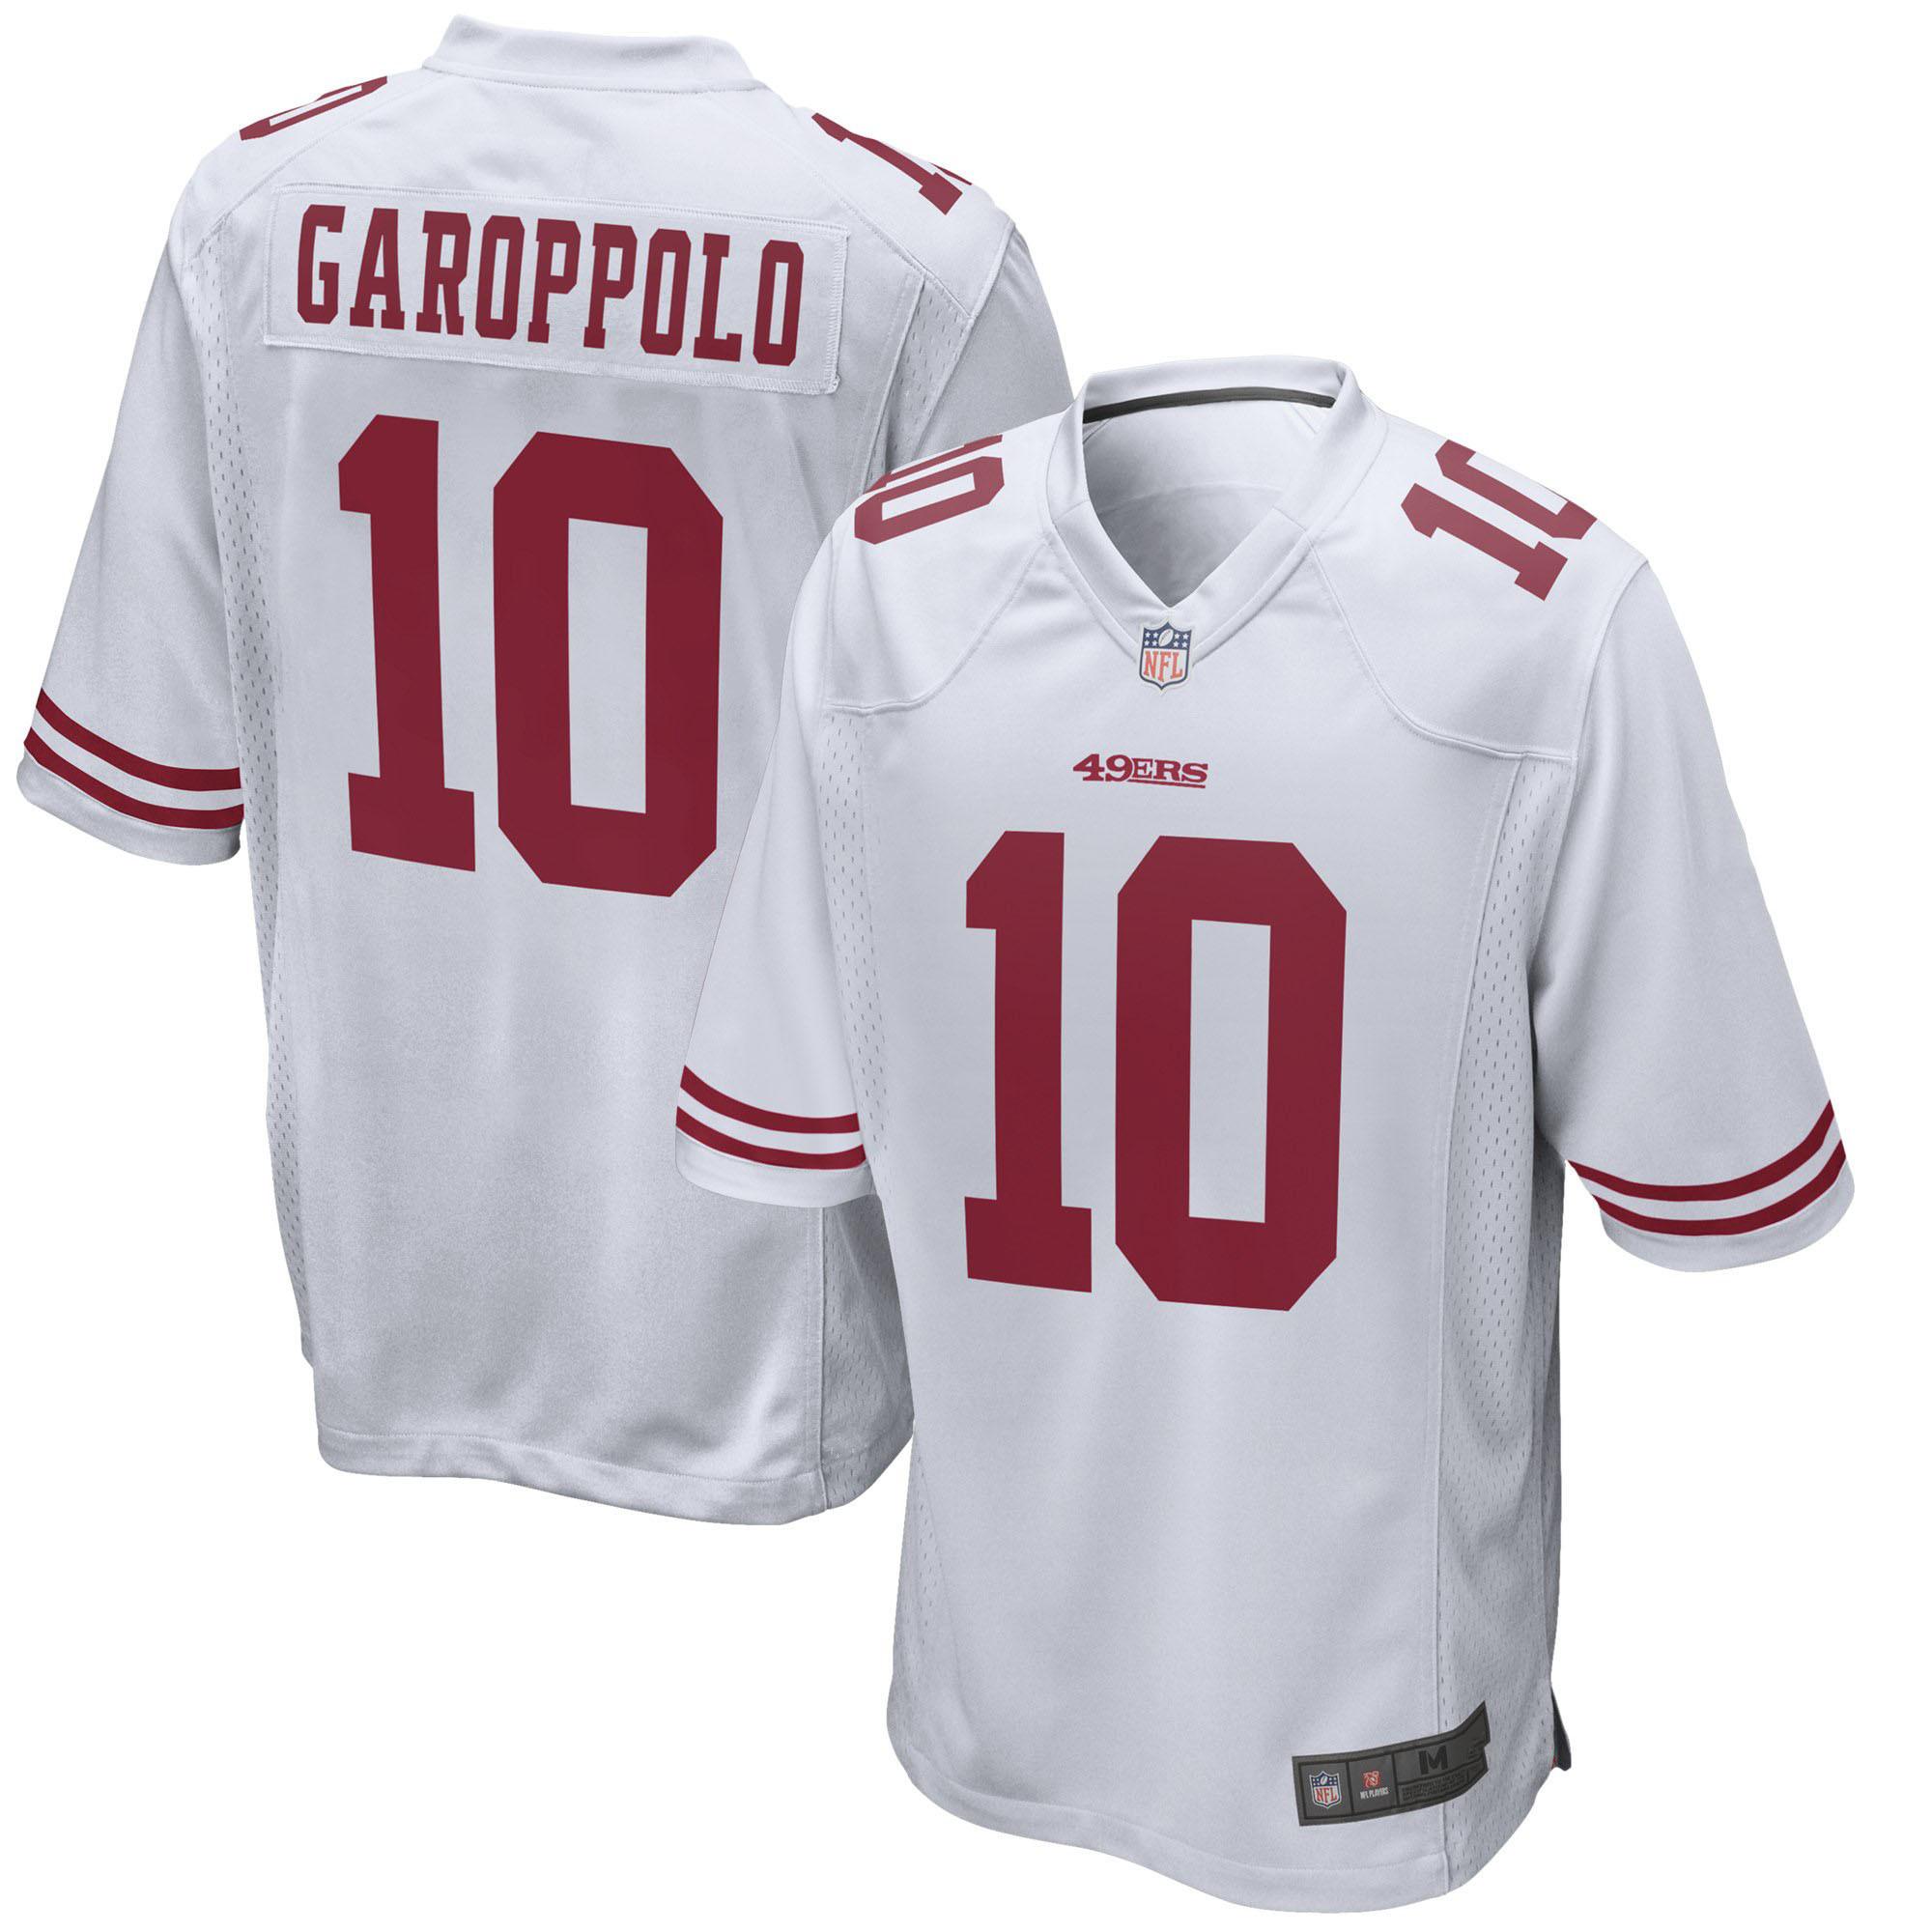 buy online 8db58 fb5c0 China 49ers Jimmy Garoppolo Red White Black Alternate Game ...